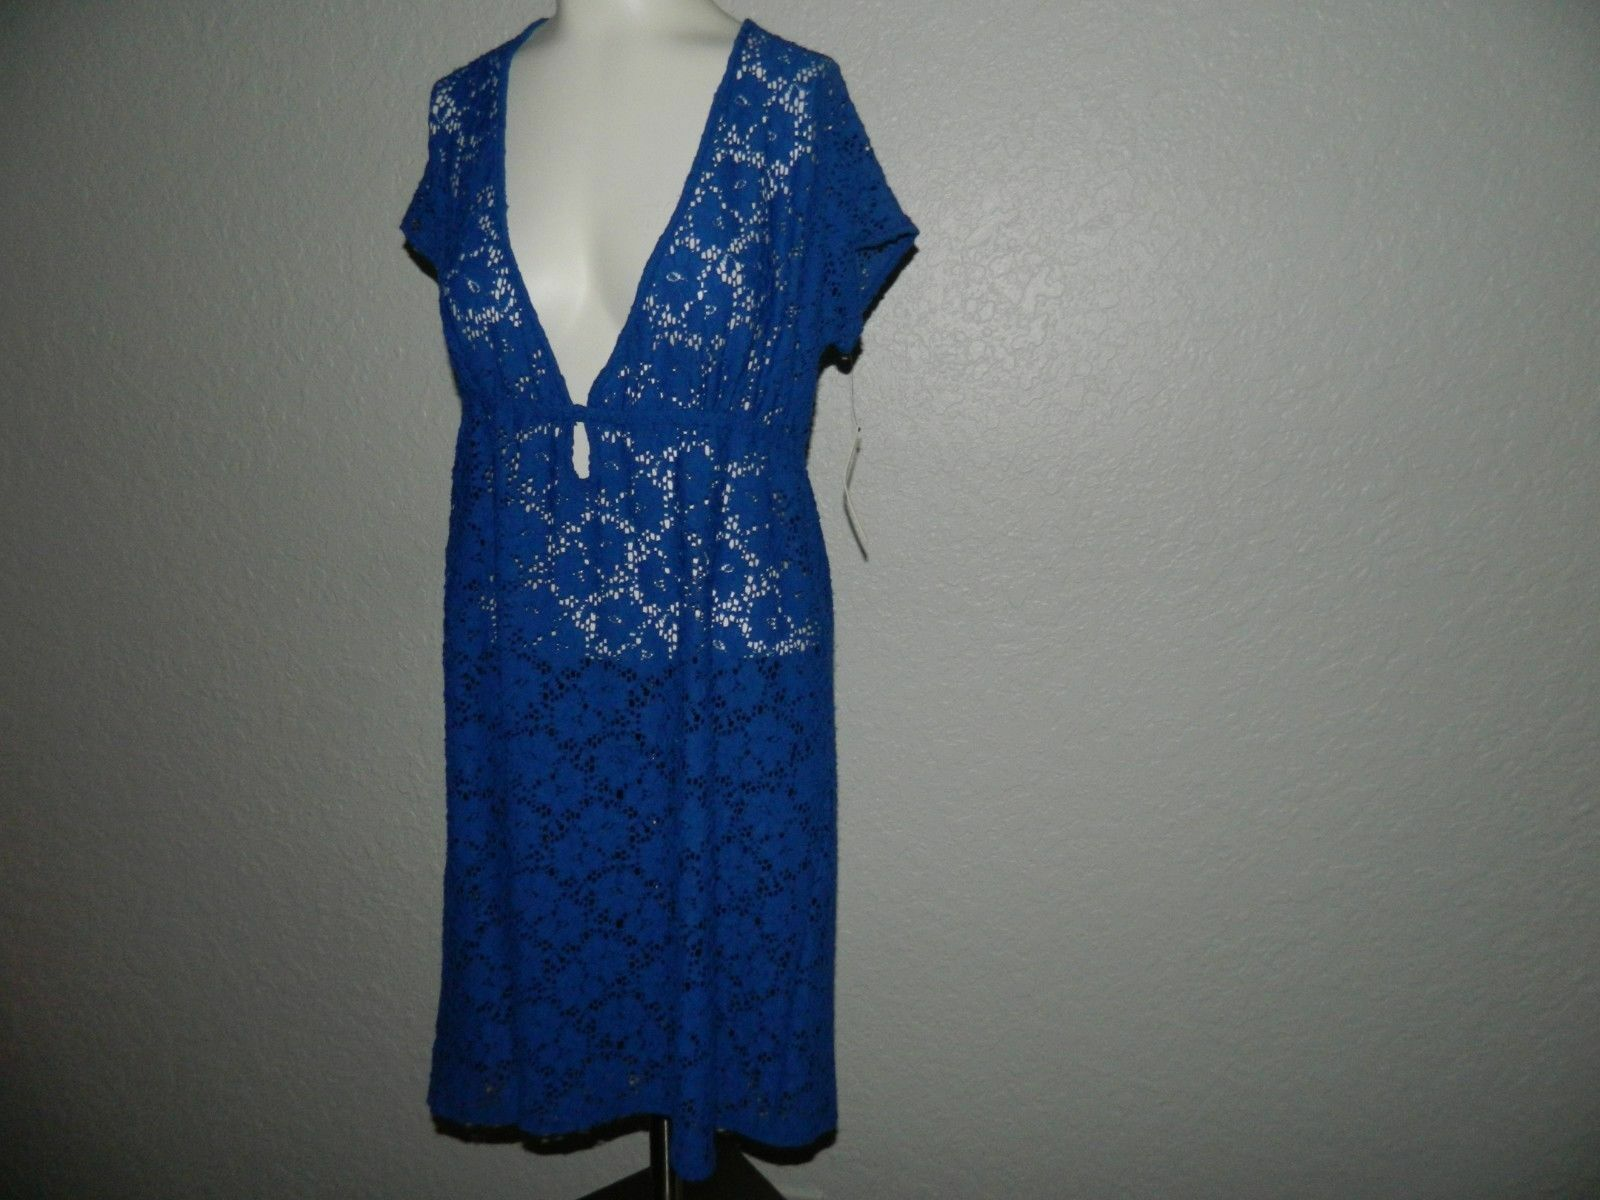 NWT    105 Laundry by Design Women Bright bluee Beach Cover Up sz M d6e939